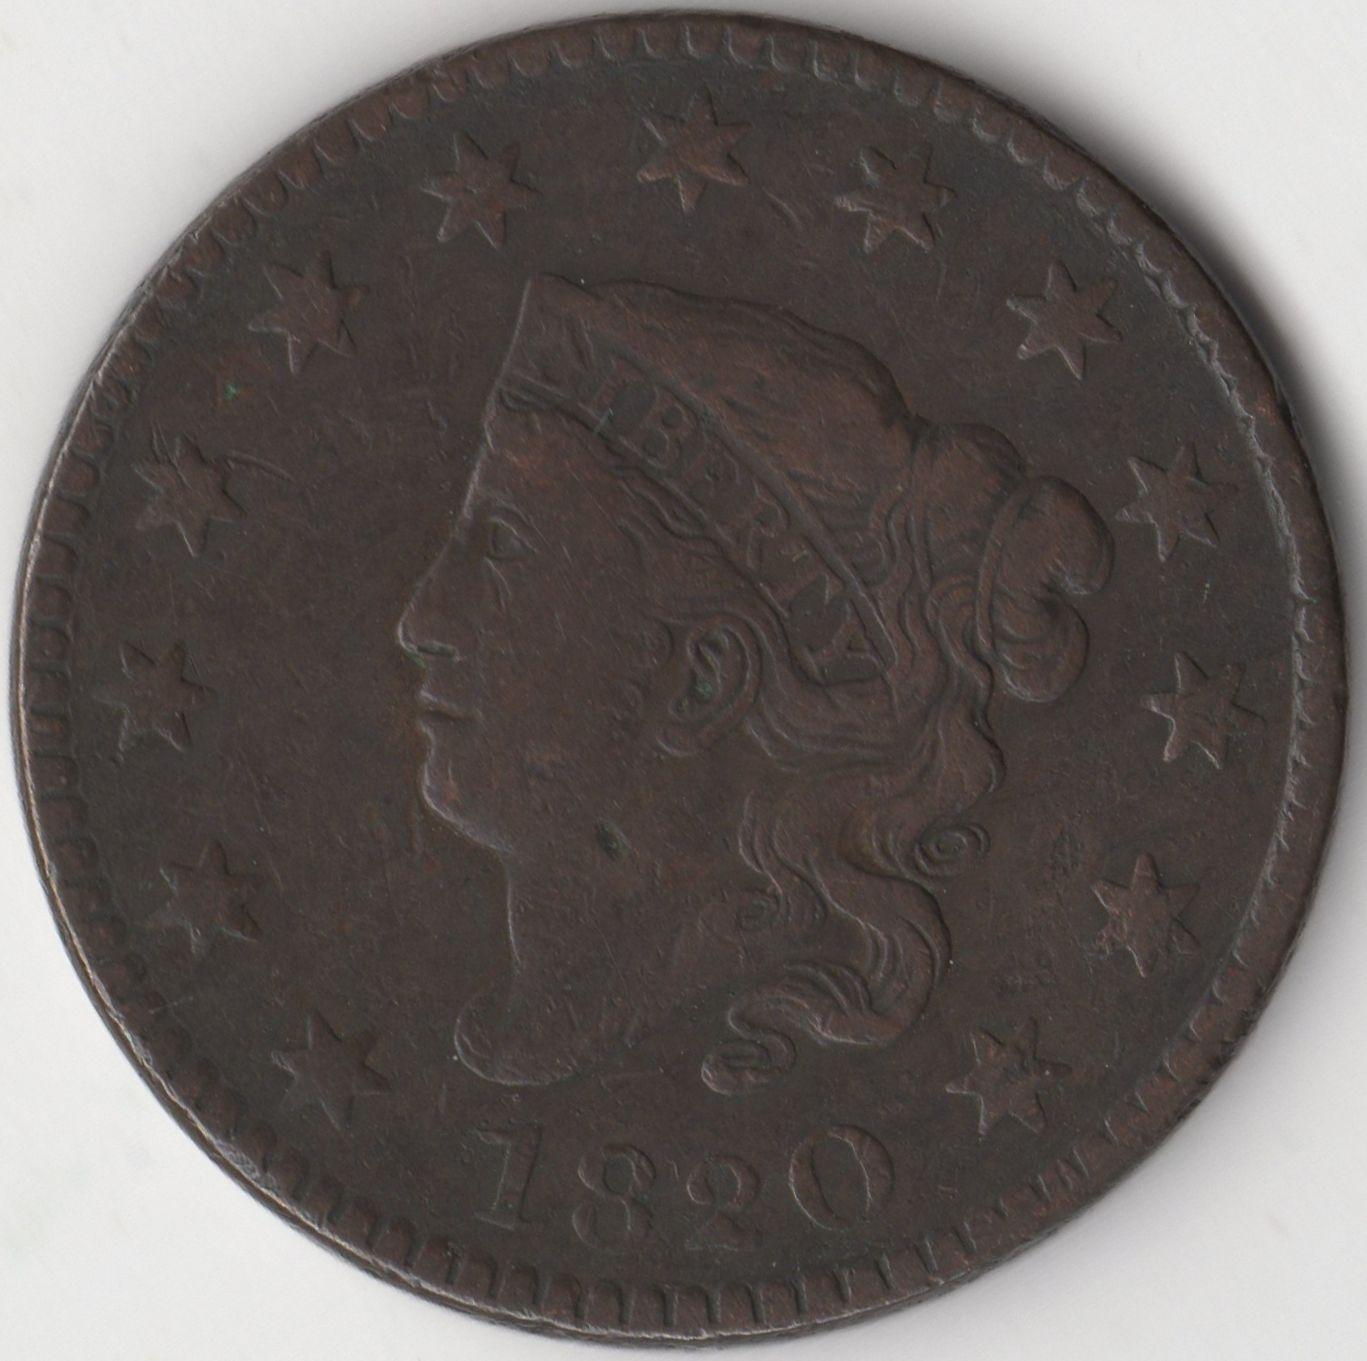 1820 U S A Coronet One Cent World Coins Pennies2pounds Coins World Coins Rare Coins